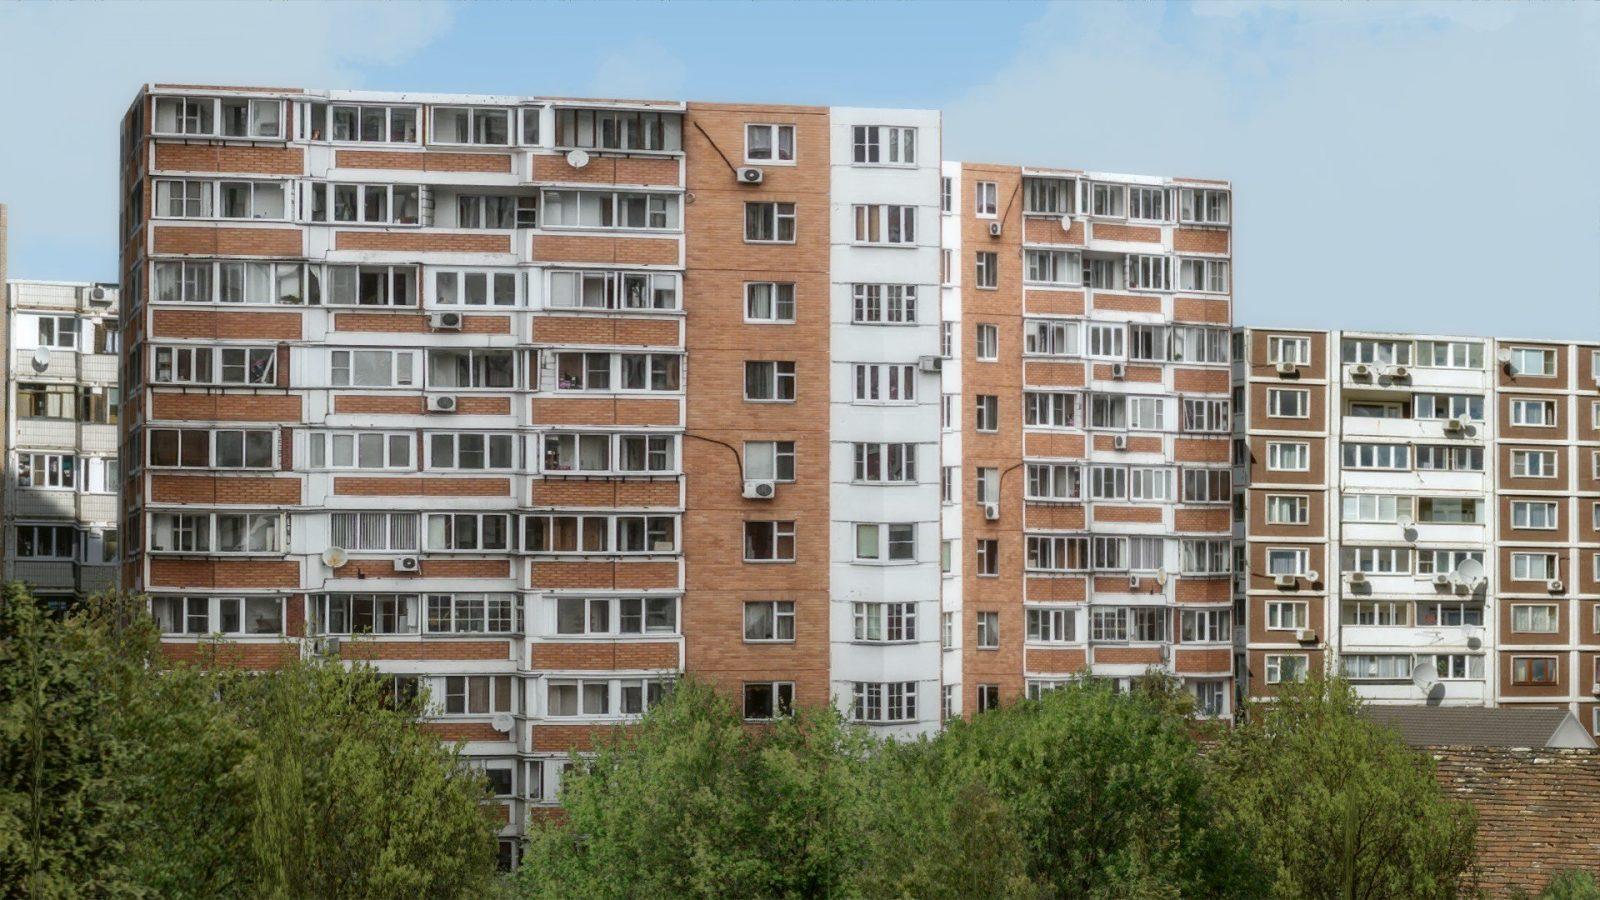 orbx-buildings-hd-previews-14-1600x900.j